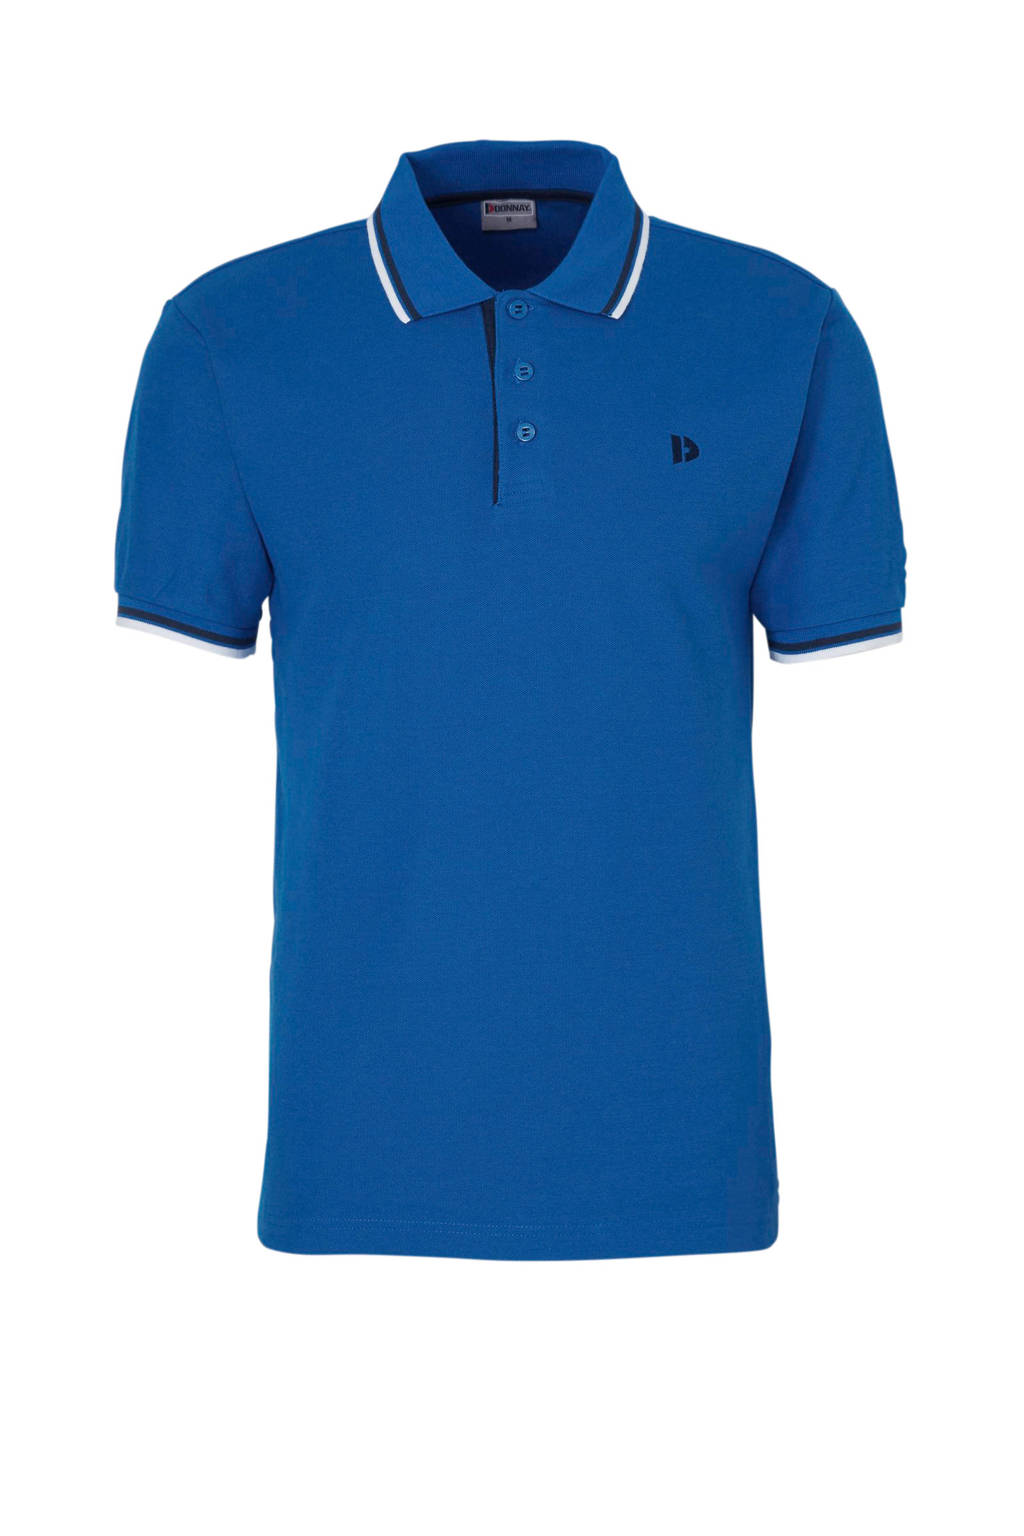 Donnay   sportpolo koningsblauw, Koningsblauw